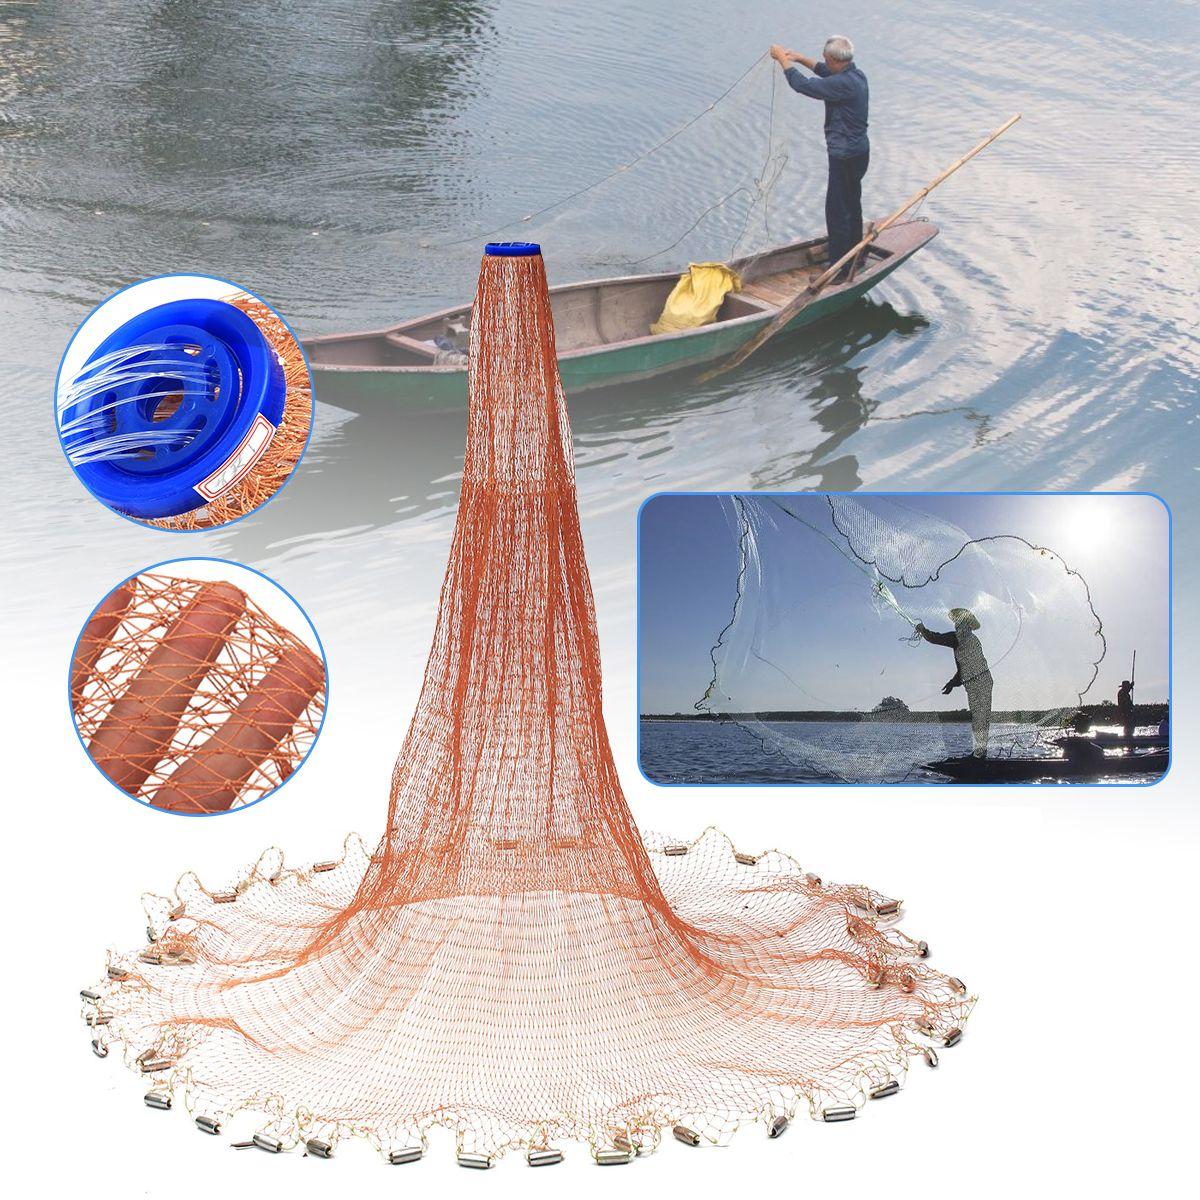 4.8M 8FT Cast Net Saltwater Bait Casting Net Strong Nylon Line with Sinker